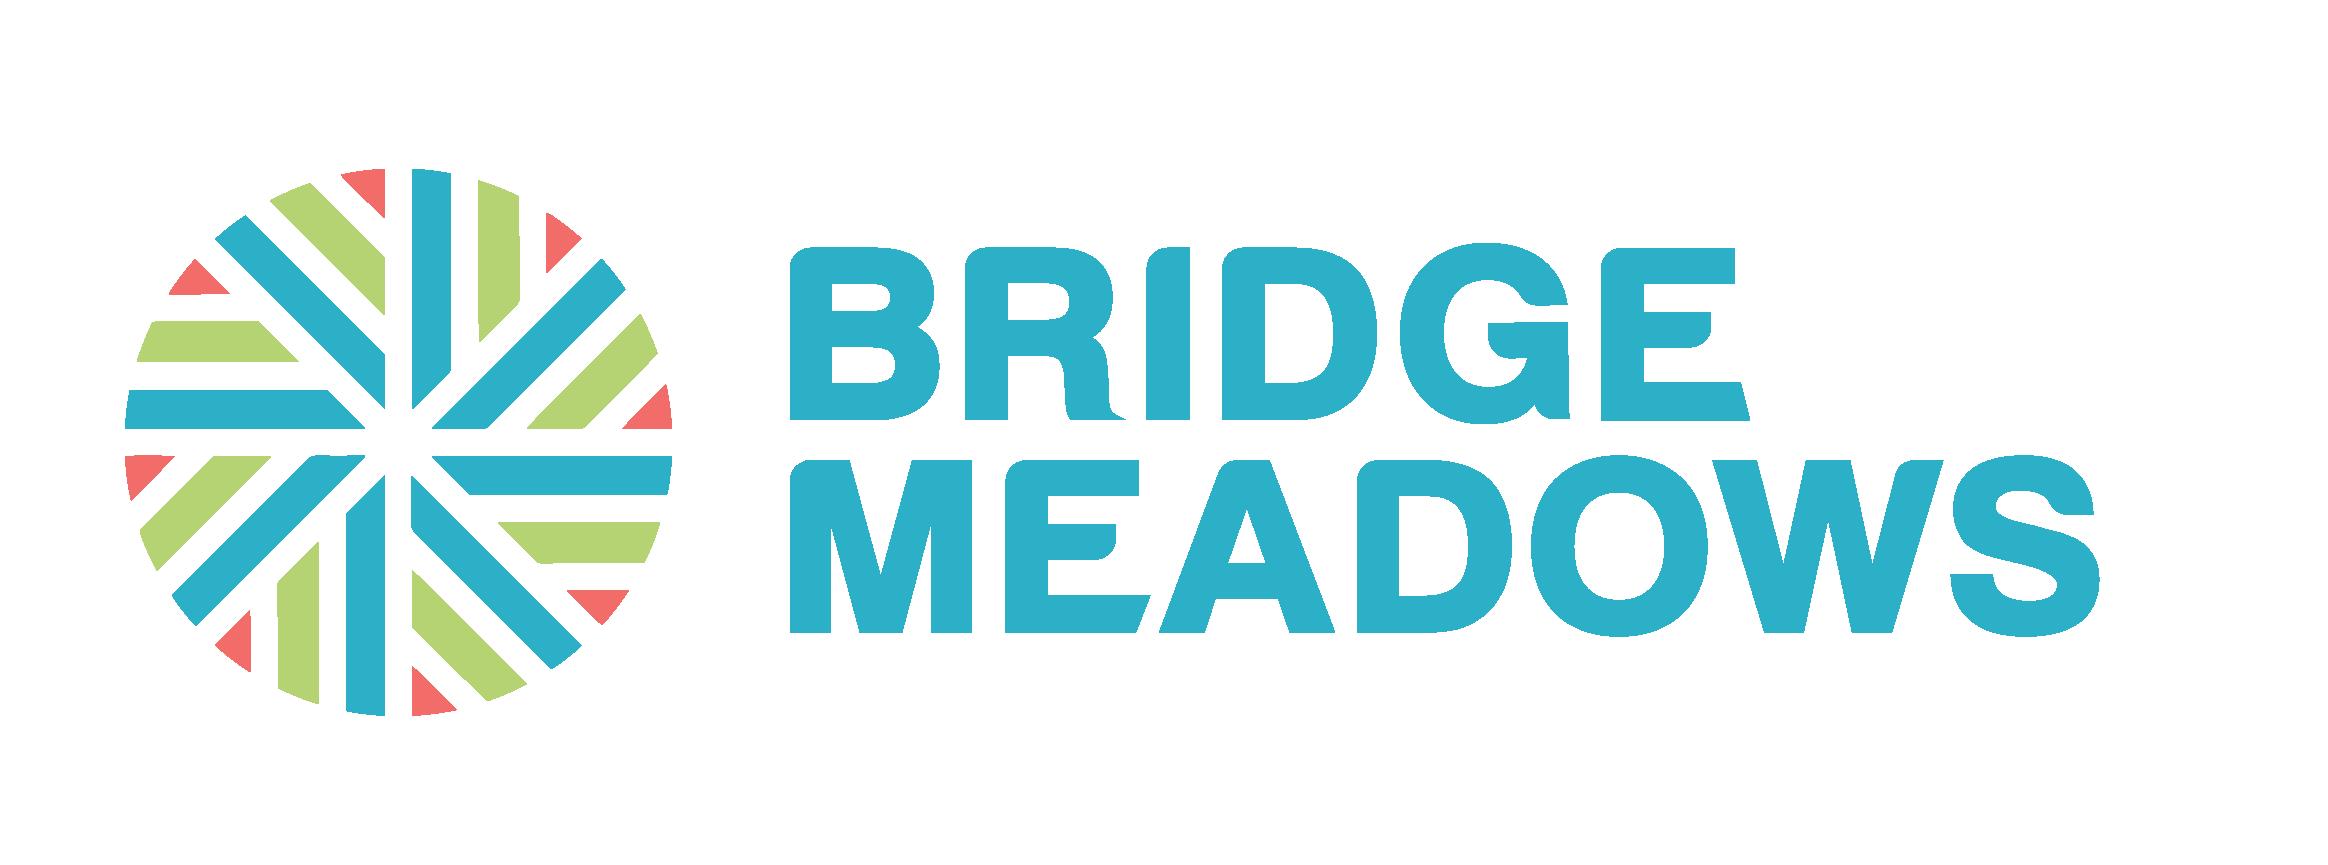 bridgemeadows